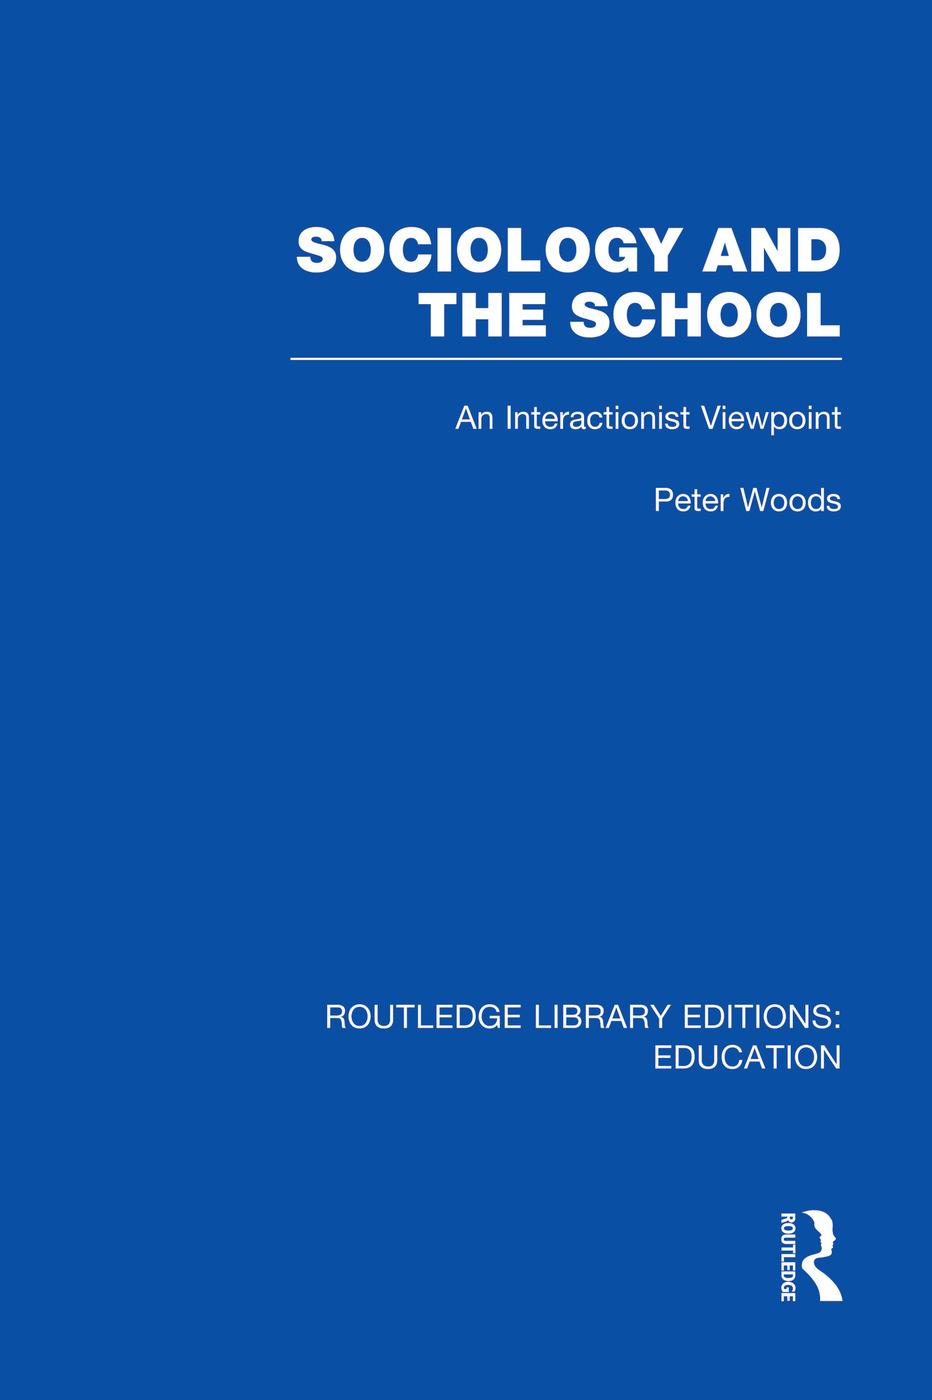 Sociology and the School (RLE Edu L)